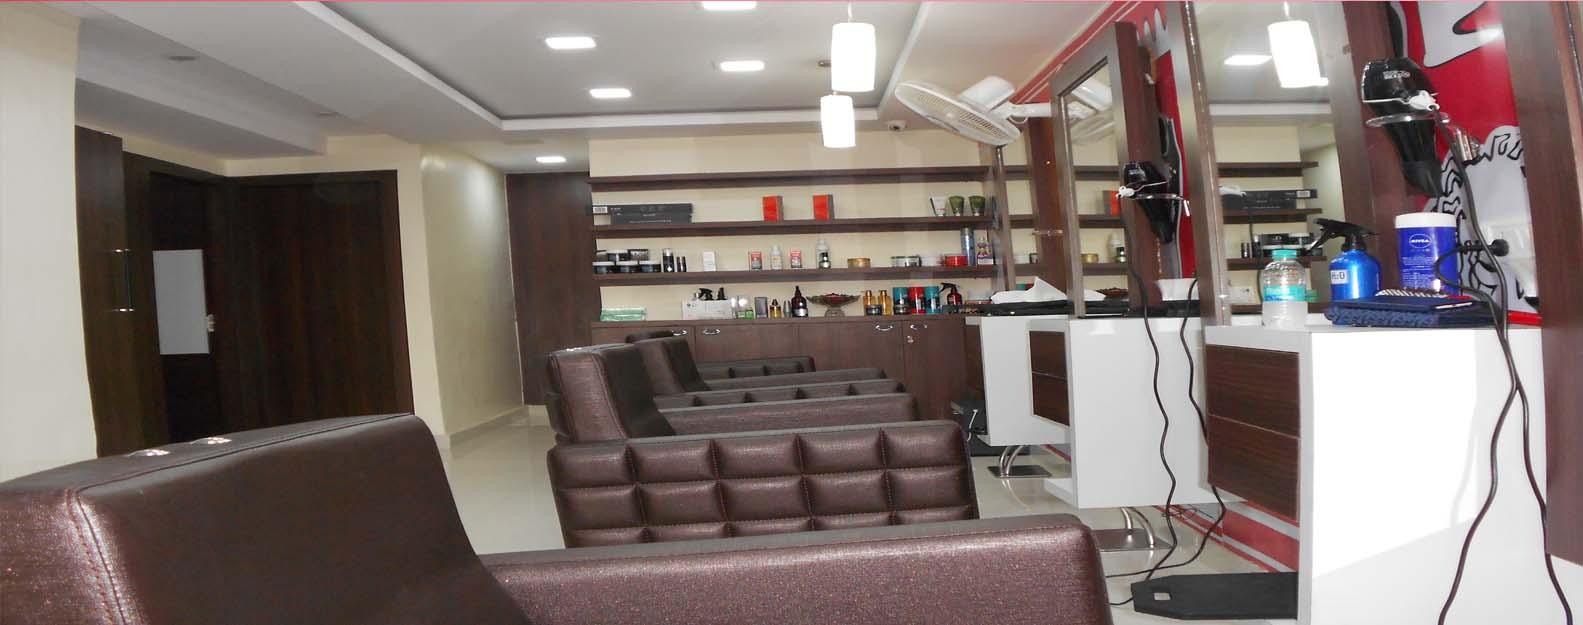 Offers On Hair Salon In Hauz Khas New Delhi Jawed Habib